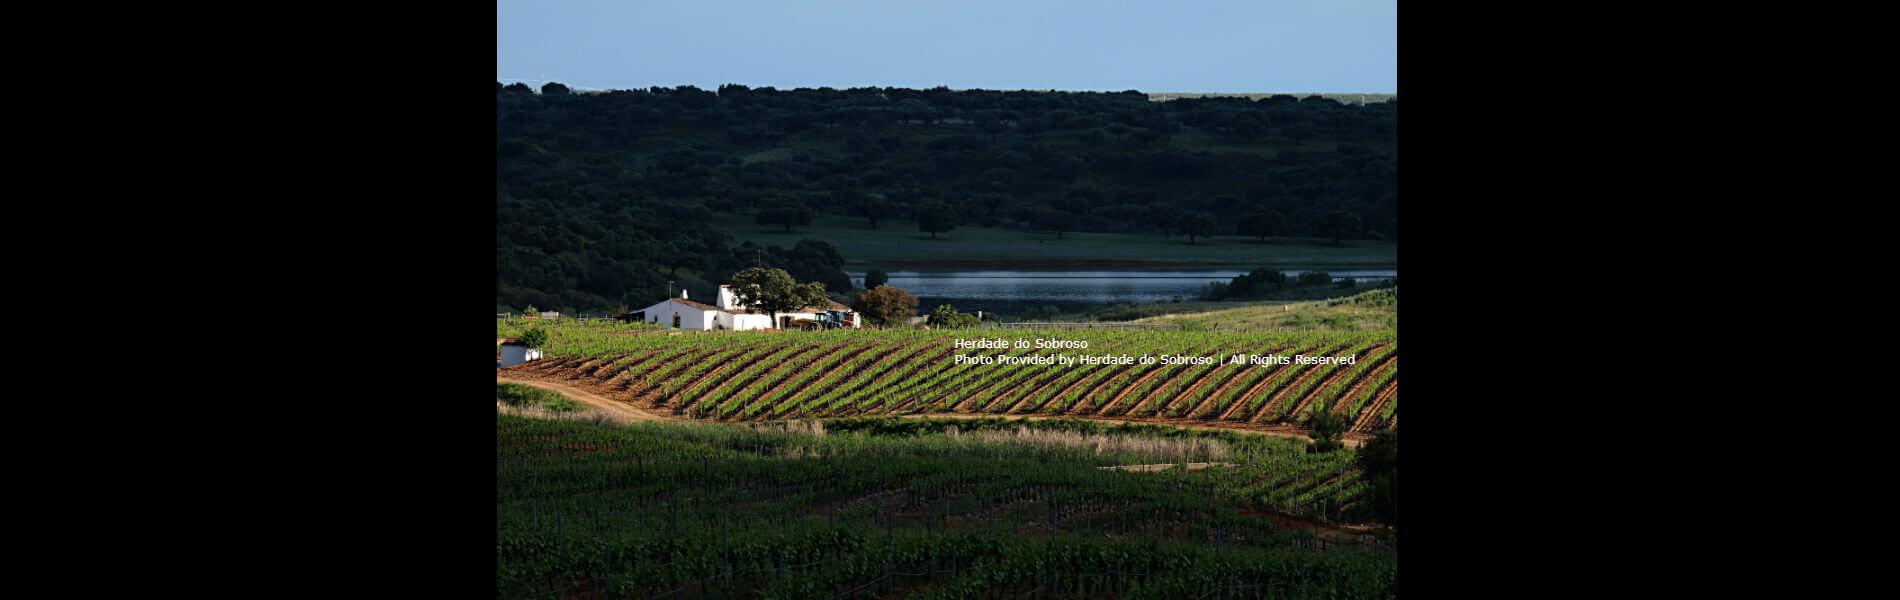 blend-all-about-wine-herdade-sobroso-herdade-slider